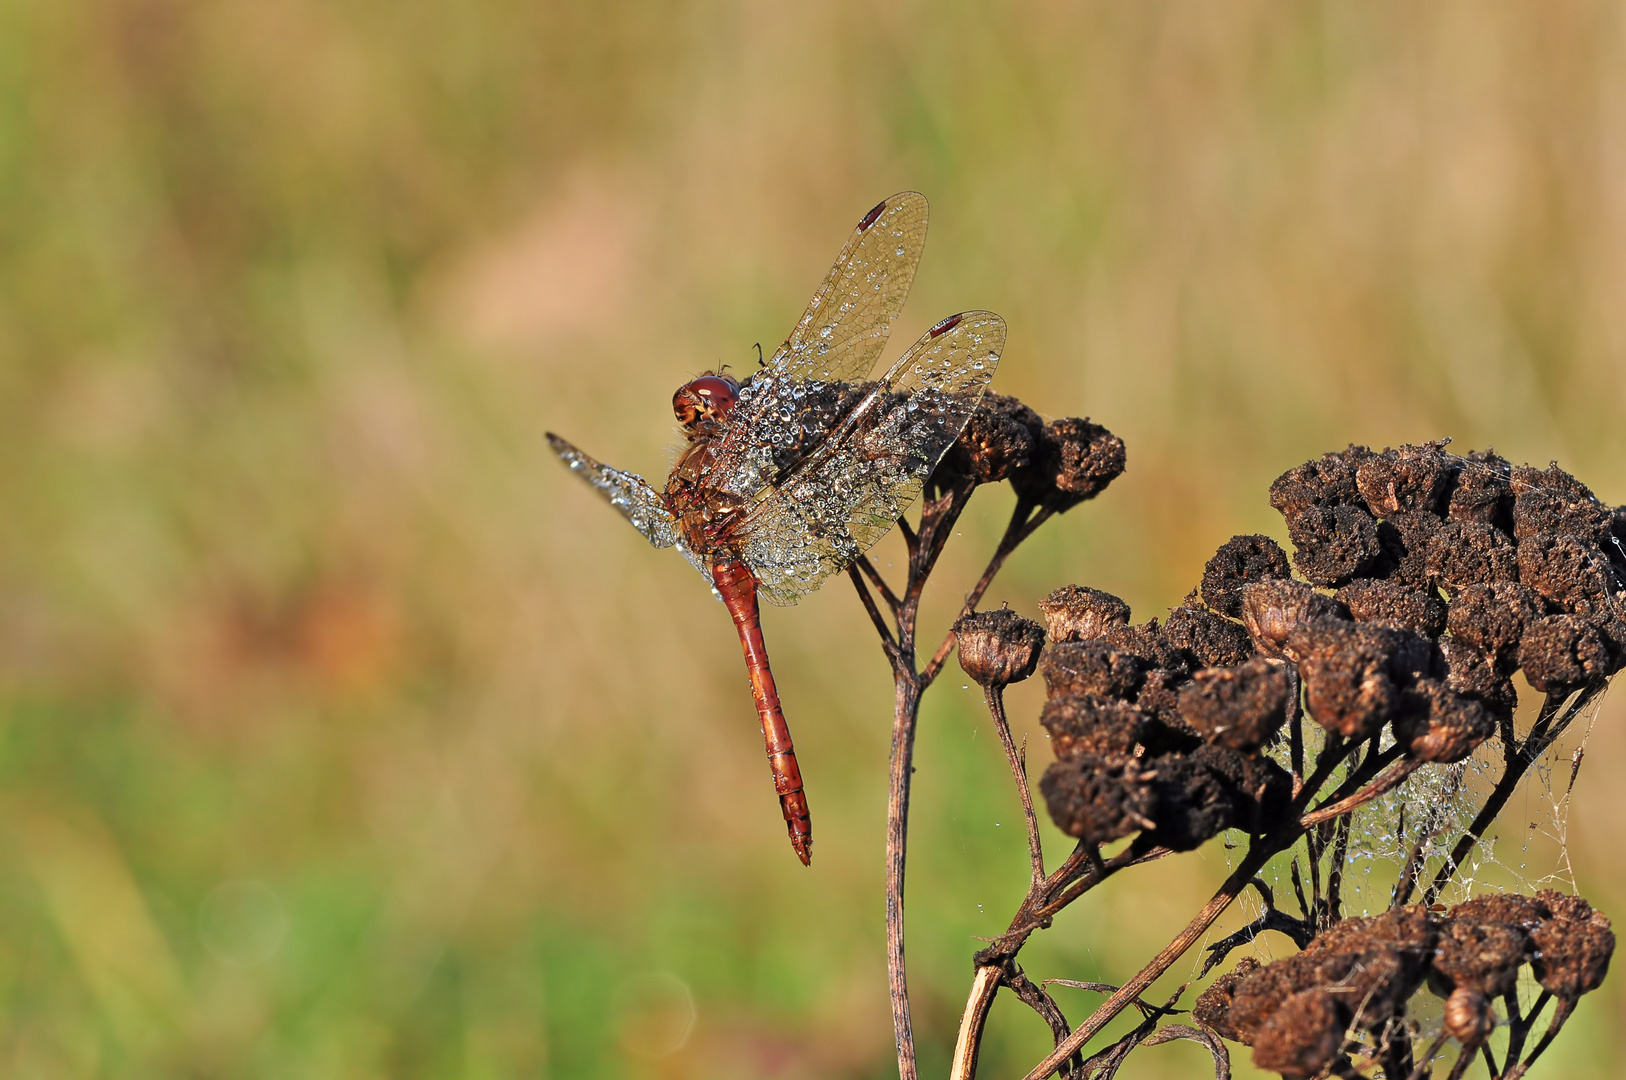 Oktober Libelle #4